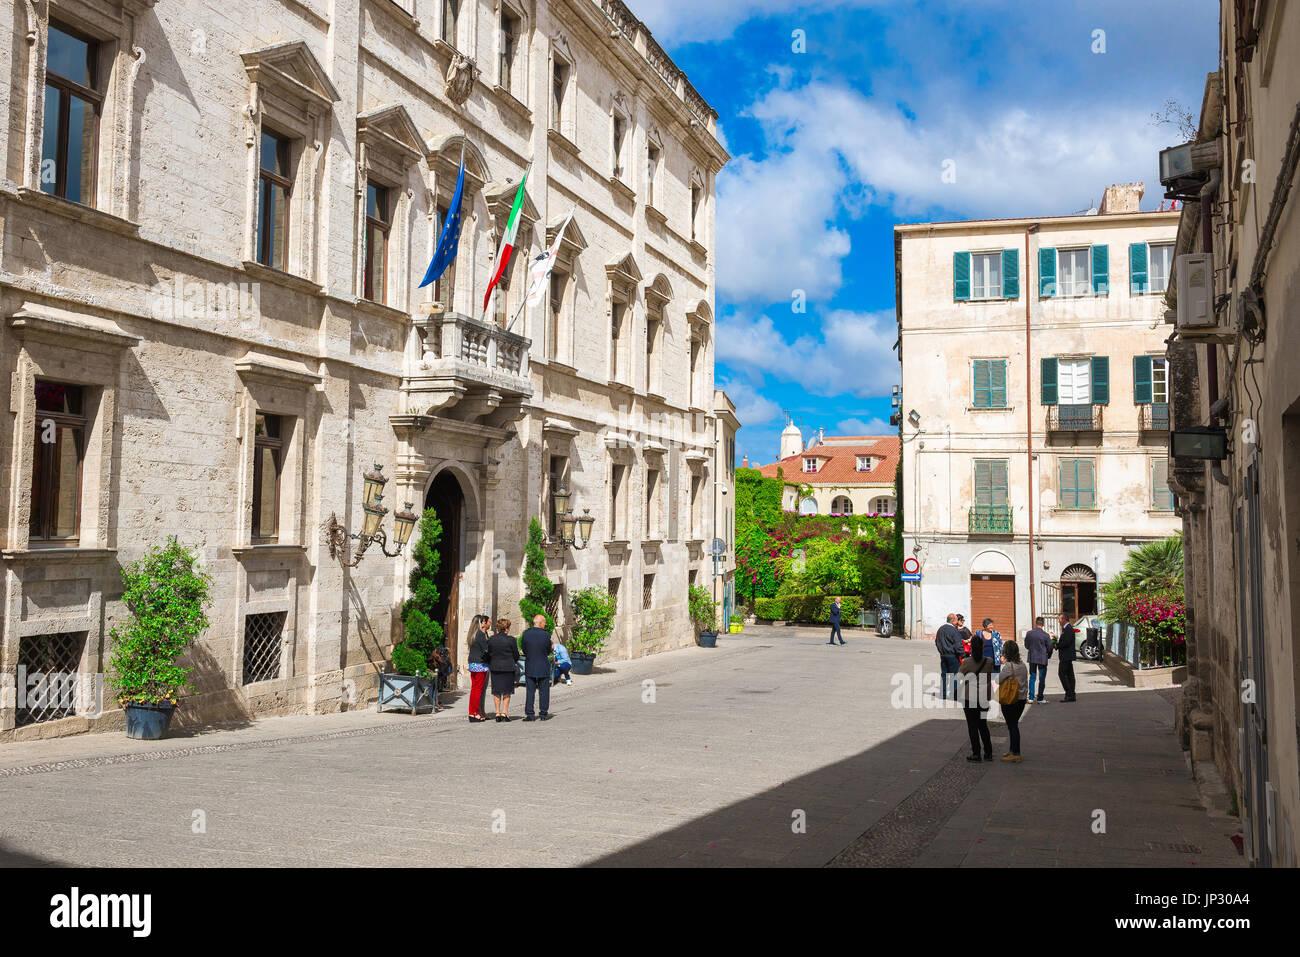 Sassari Sardinia piazza, the Piazza del Comune in Sassari, northern Sardinia, with the Palazzo Ducale on the left. - Stock Image